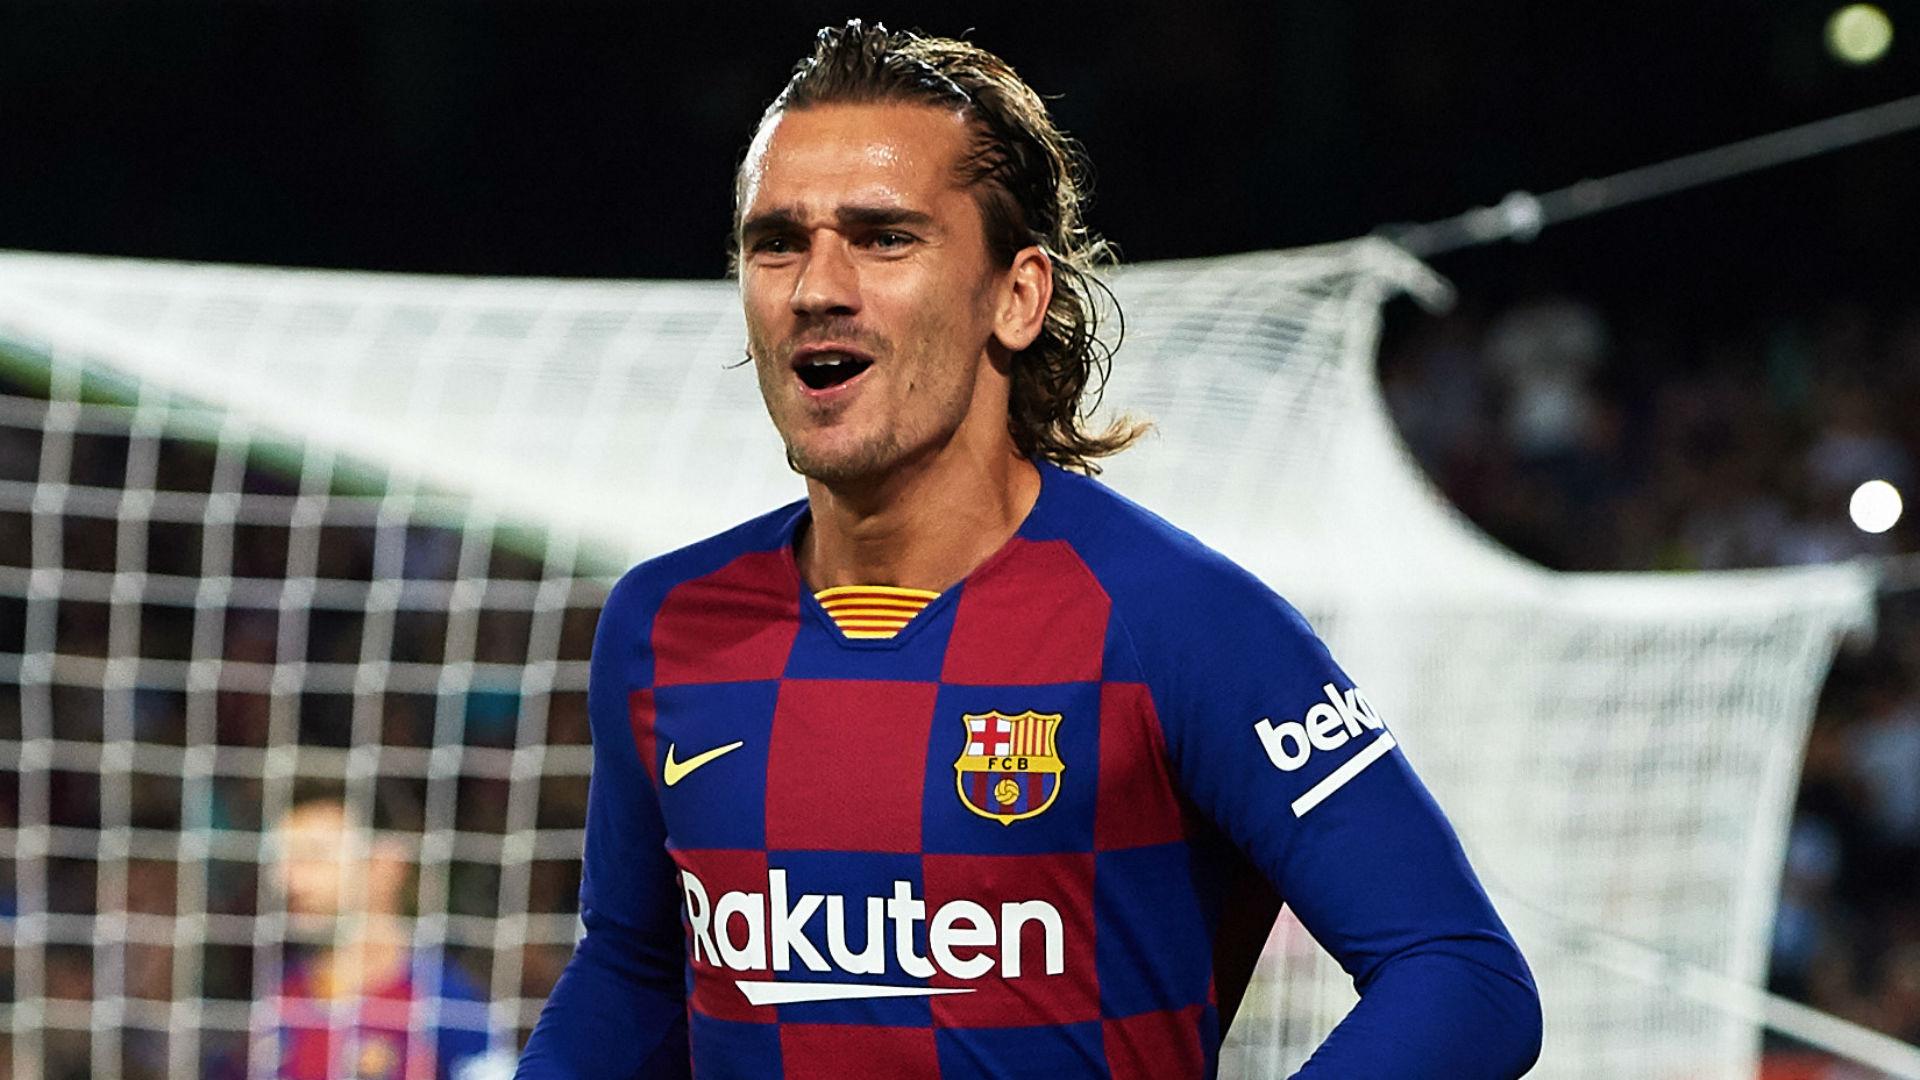 Quique Setien unimpressed by Barcelona performance against minnows UD Ibiza